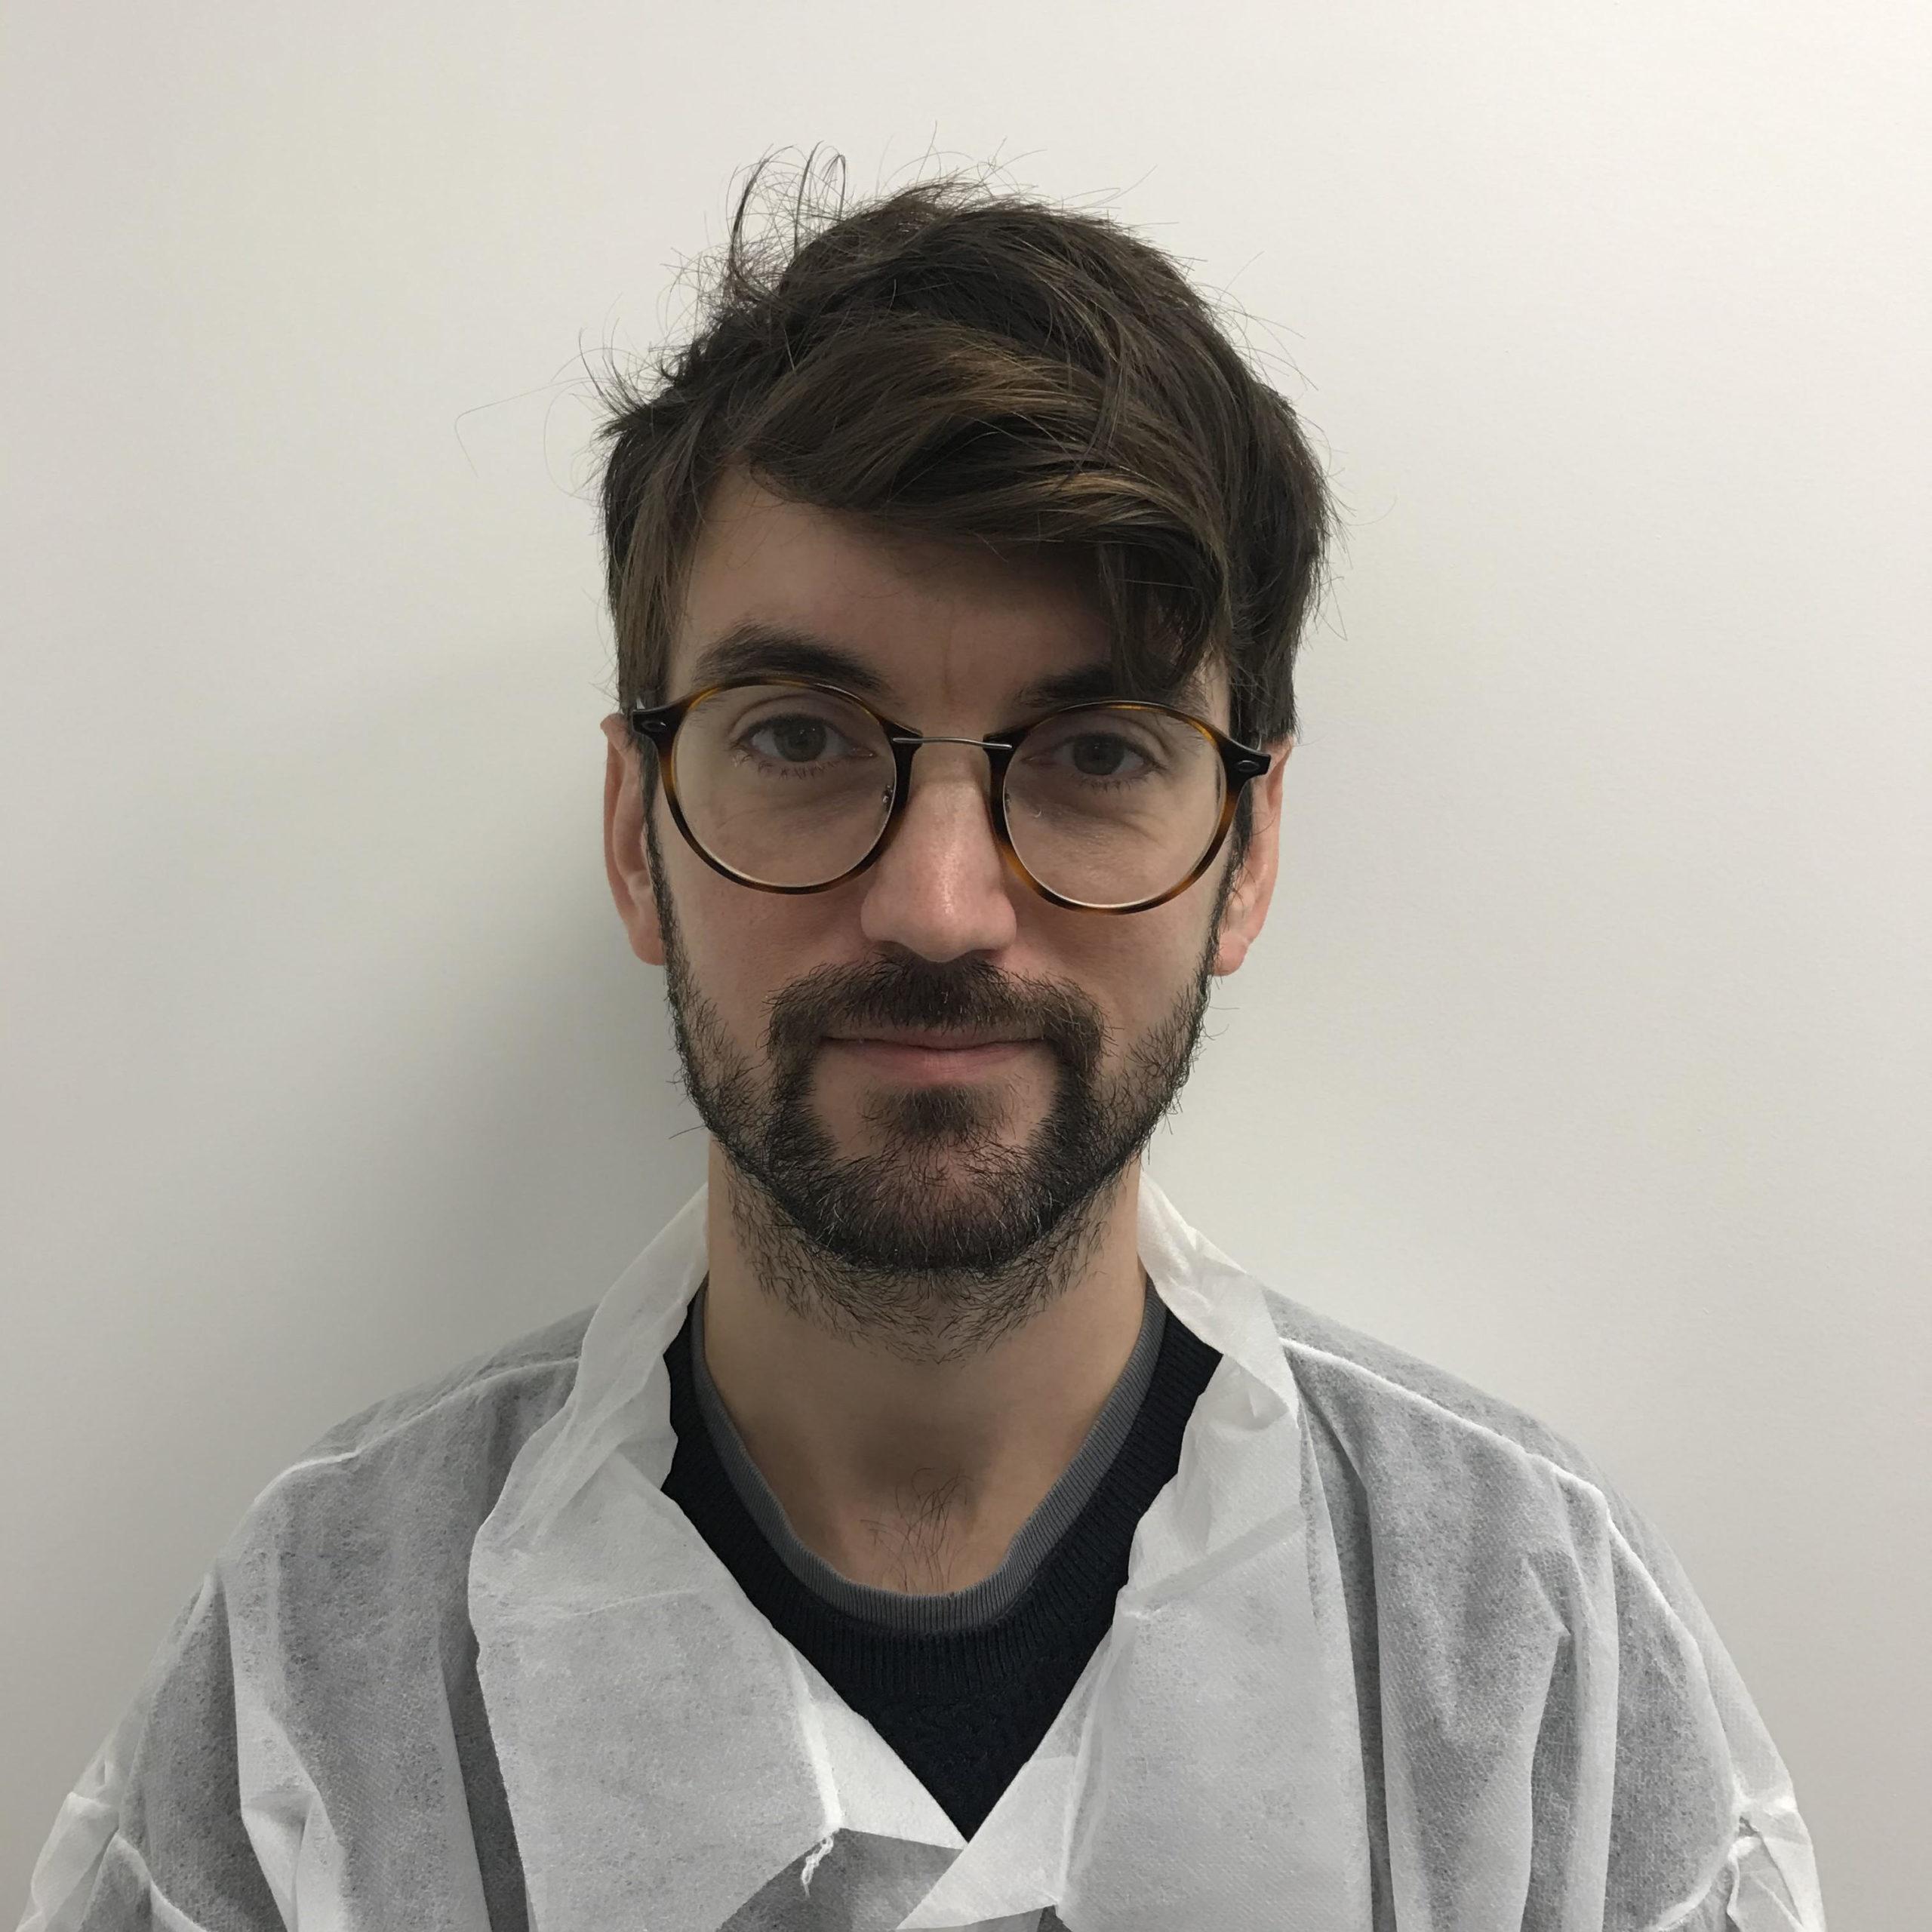 Mathieu Leclerc